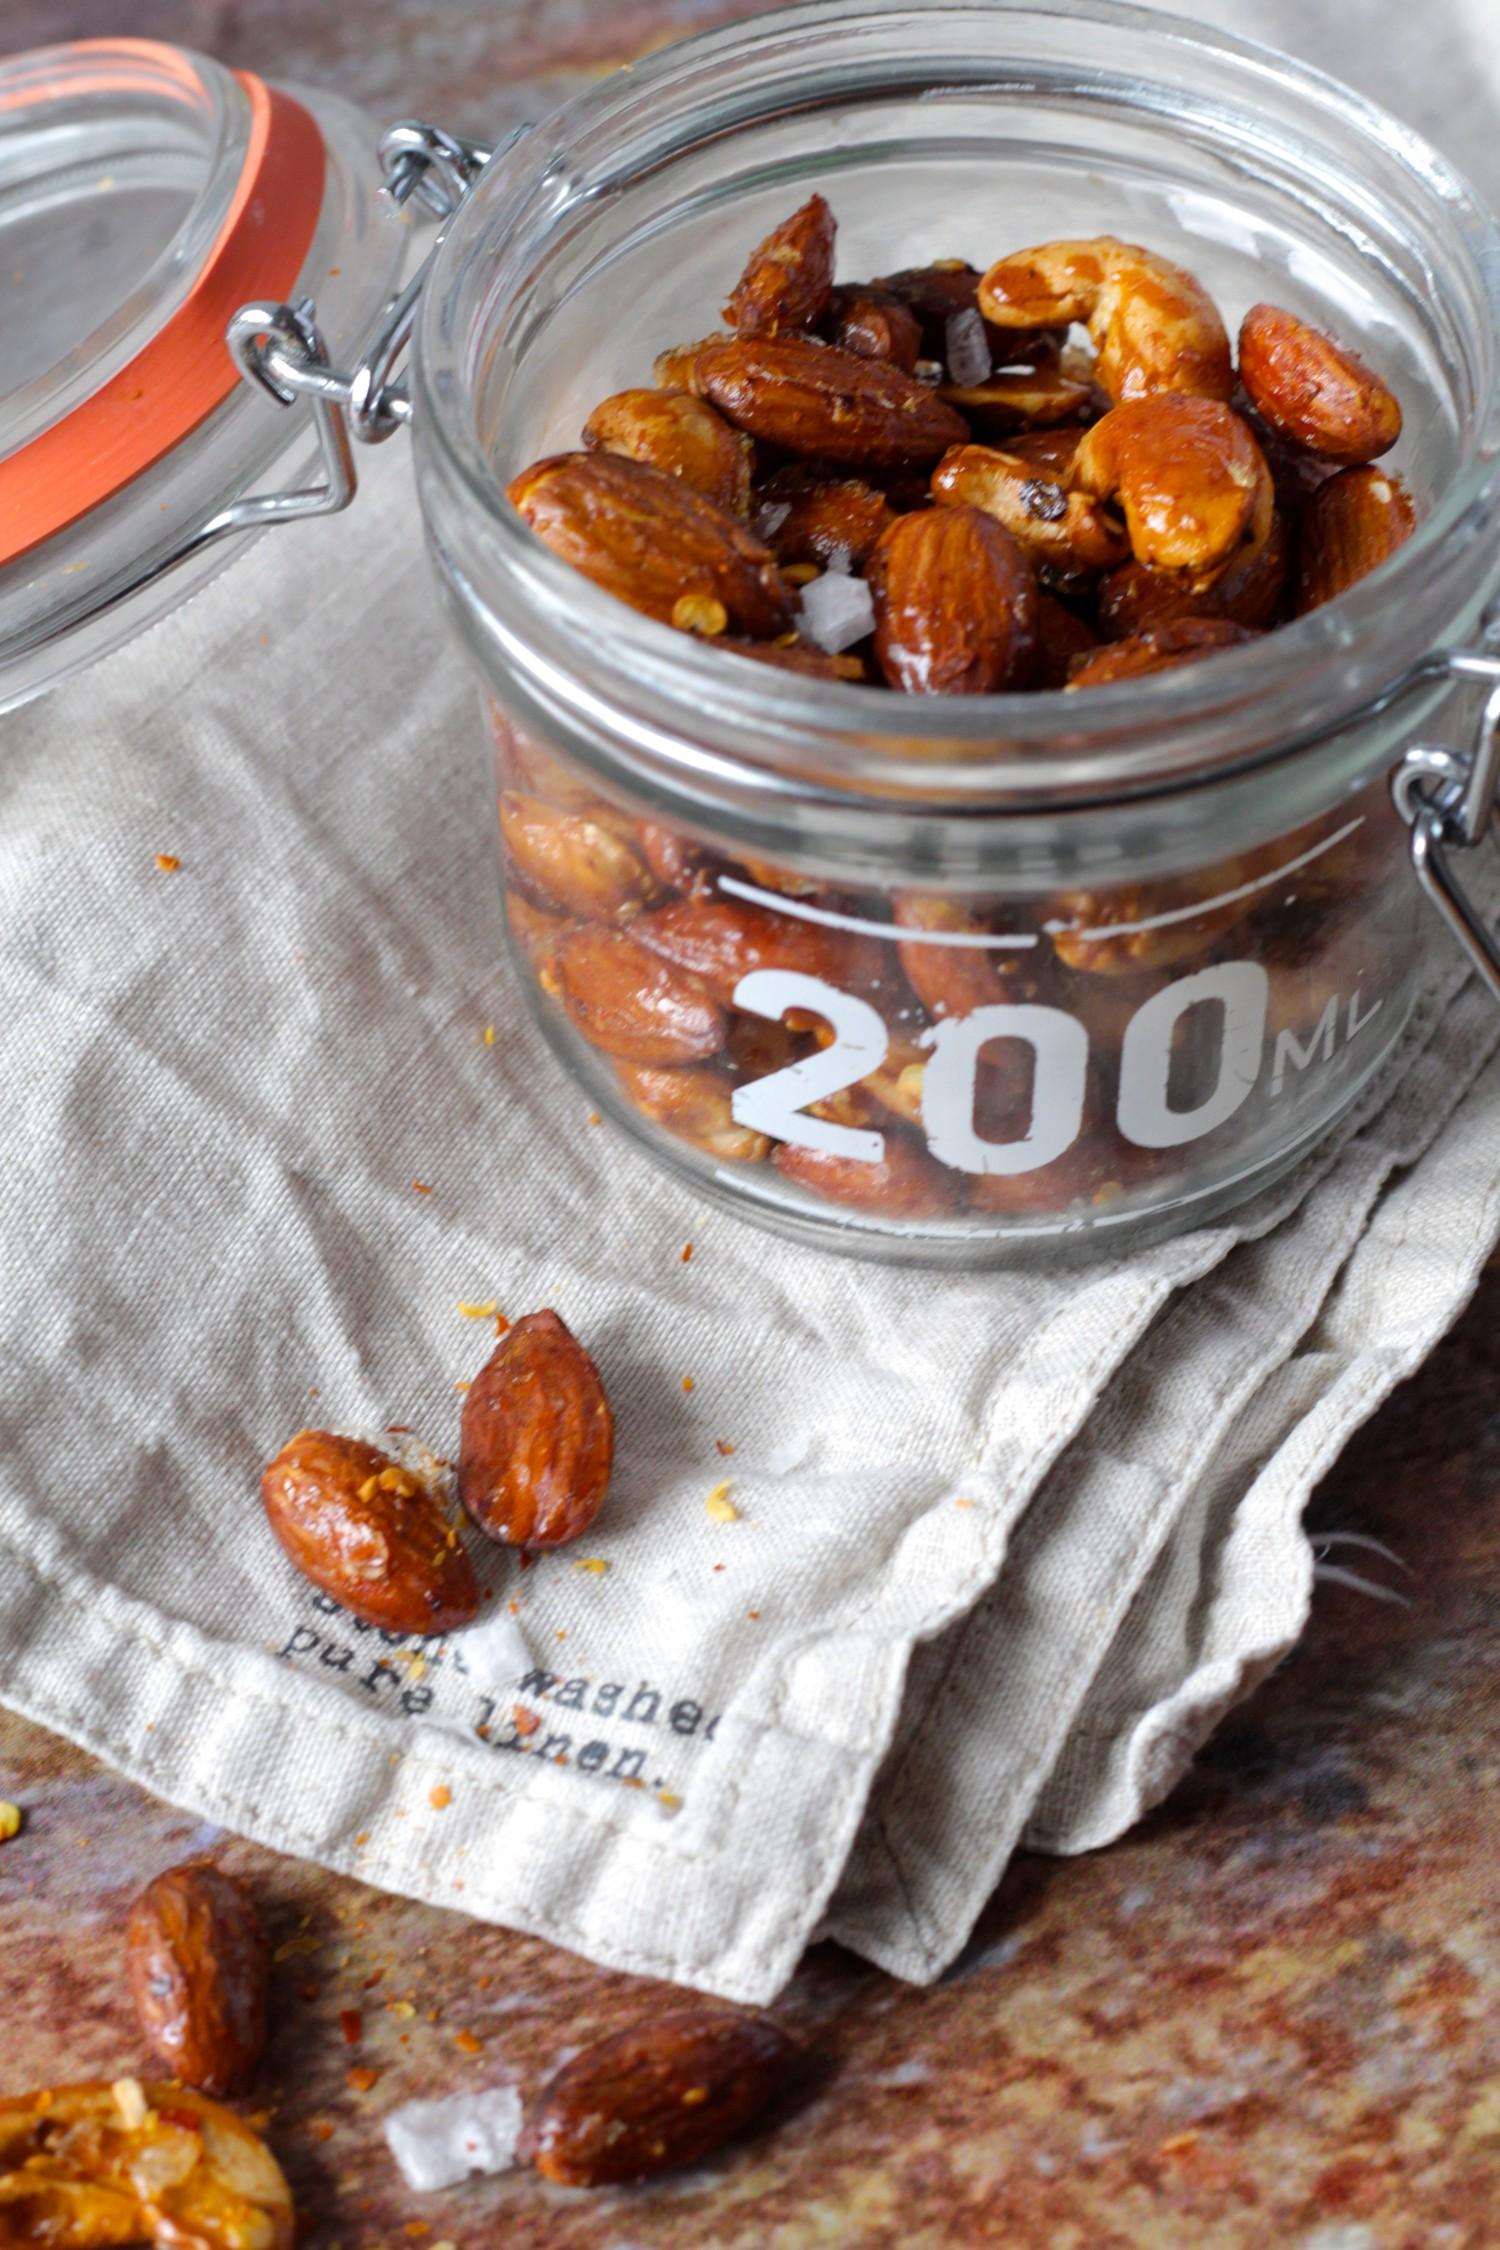 Honning ristede nødder med havsalt og chili